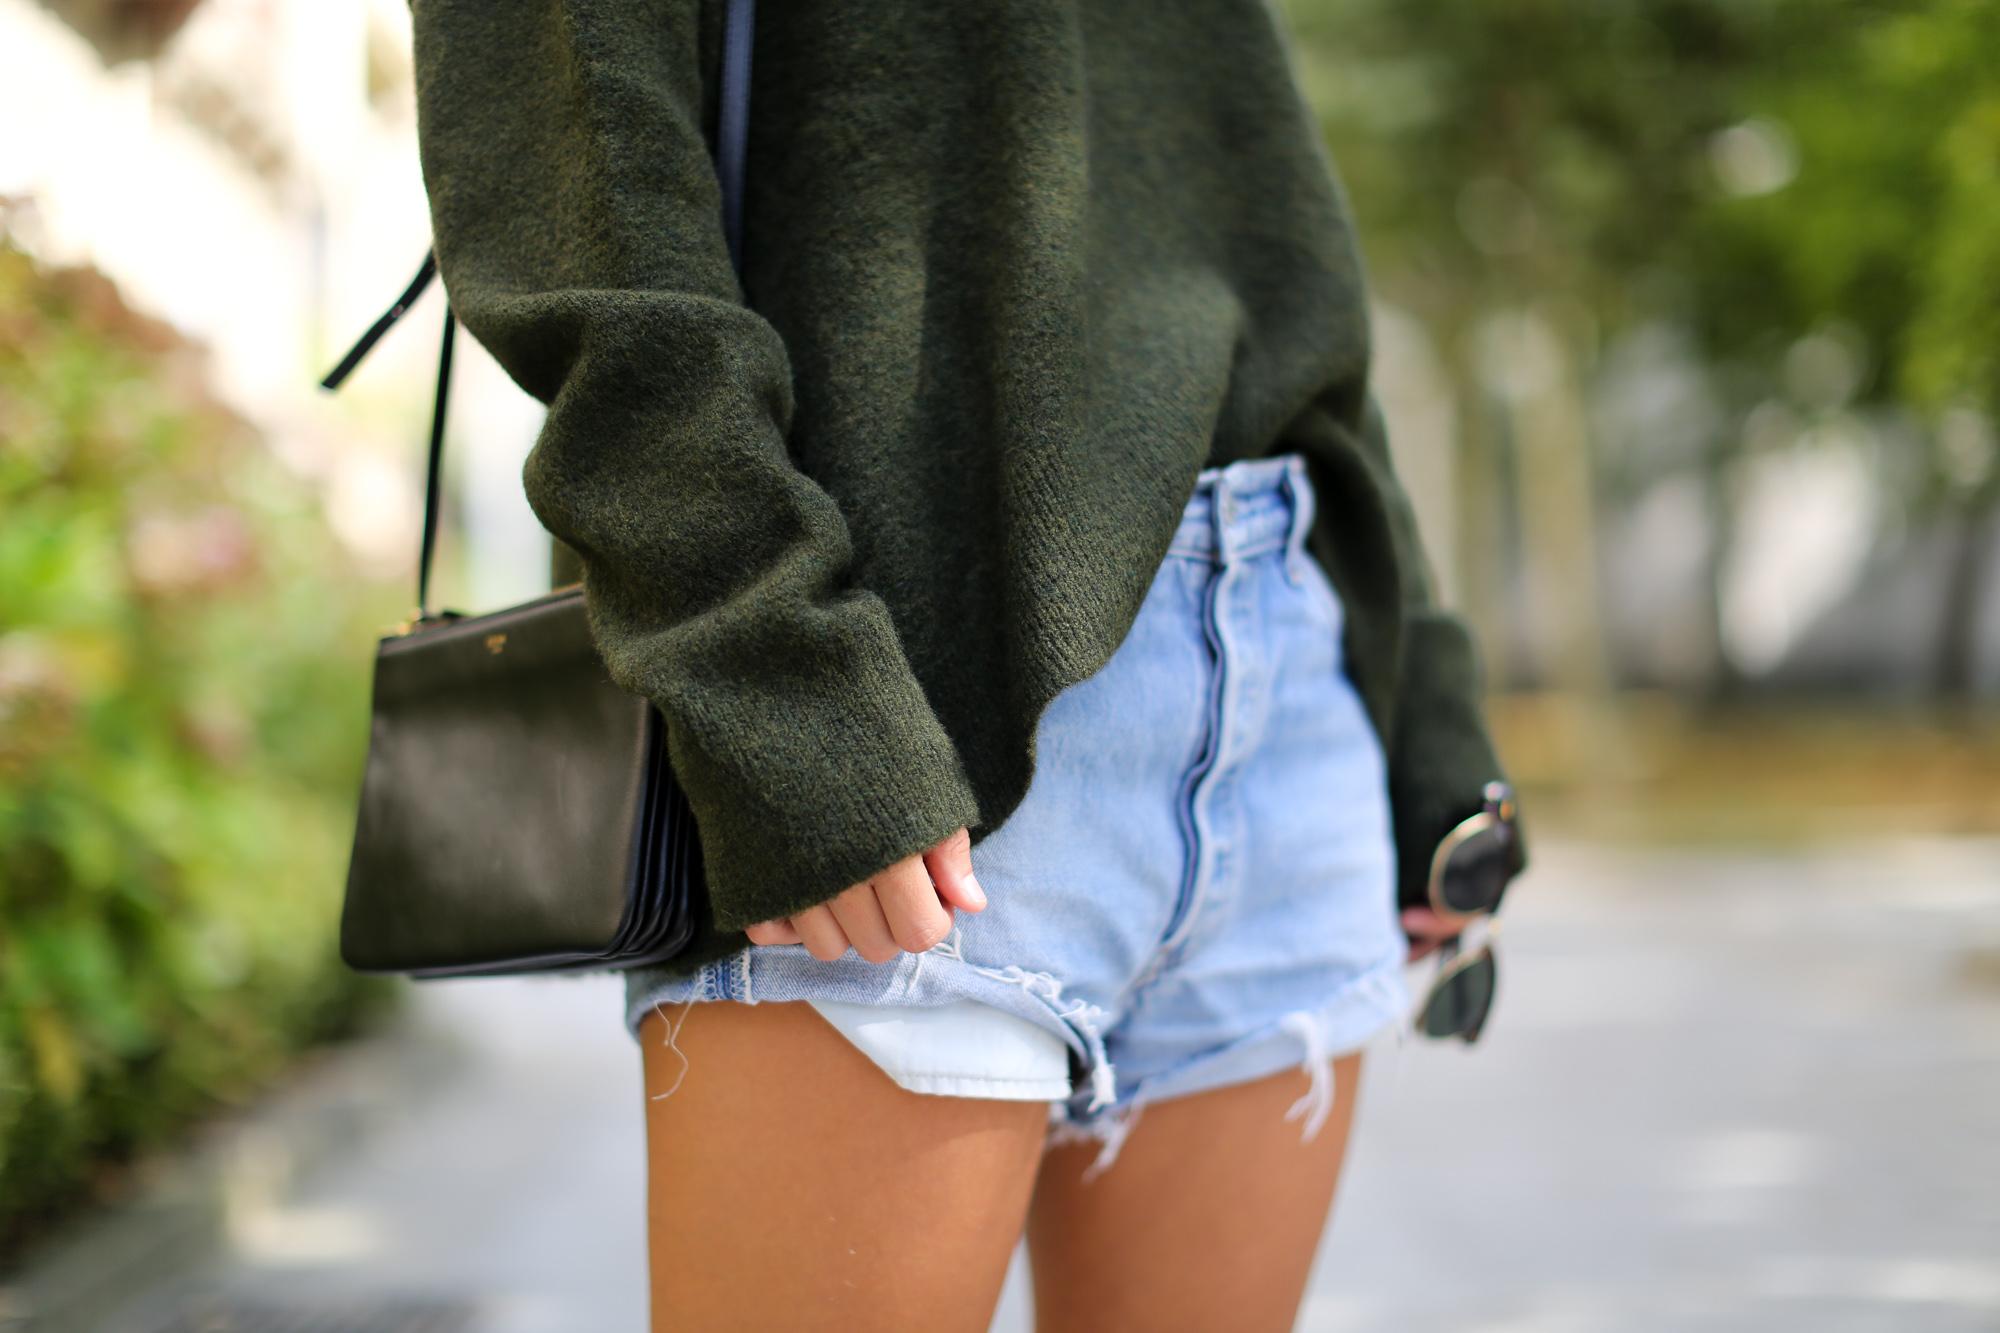 Clochet-streetstyle-levis-501-vintage-zara-khaki-knit-sliders-7